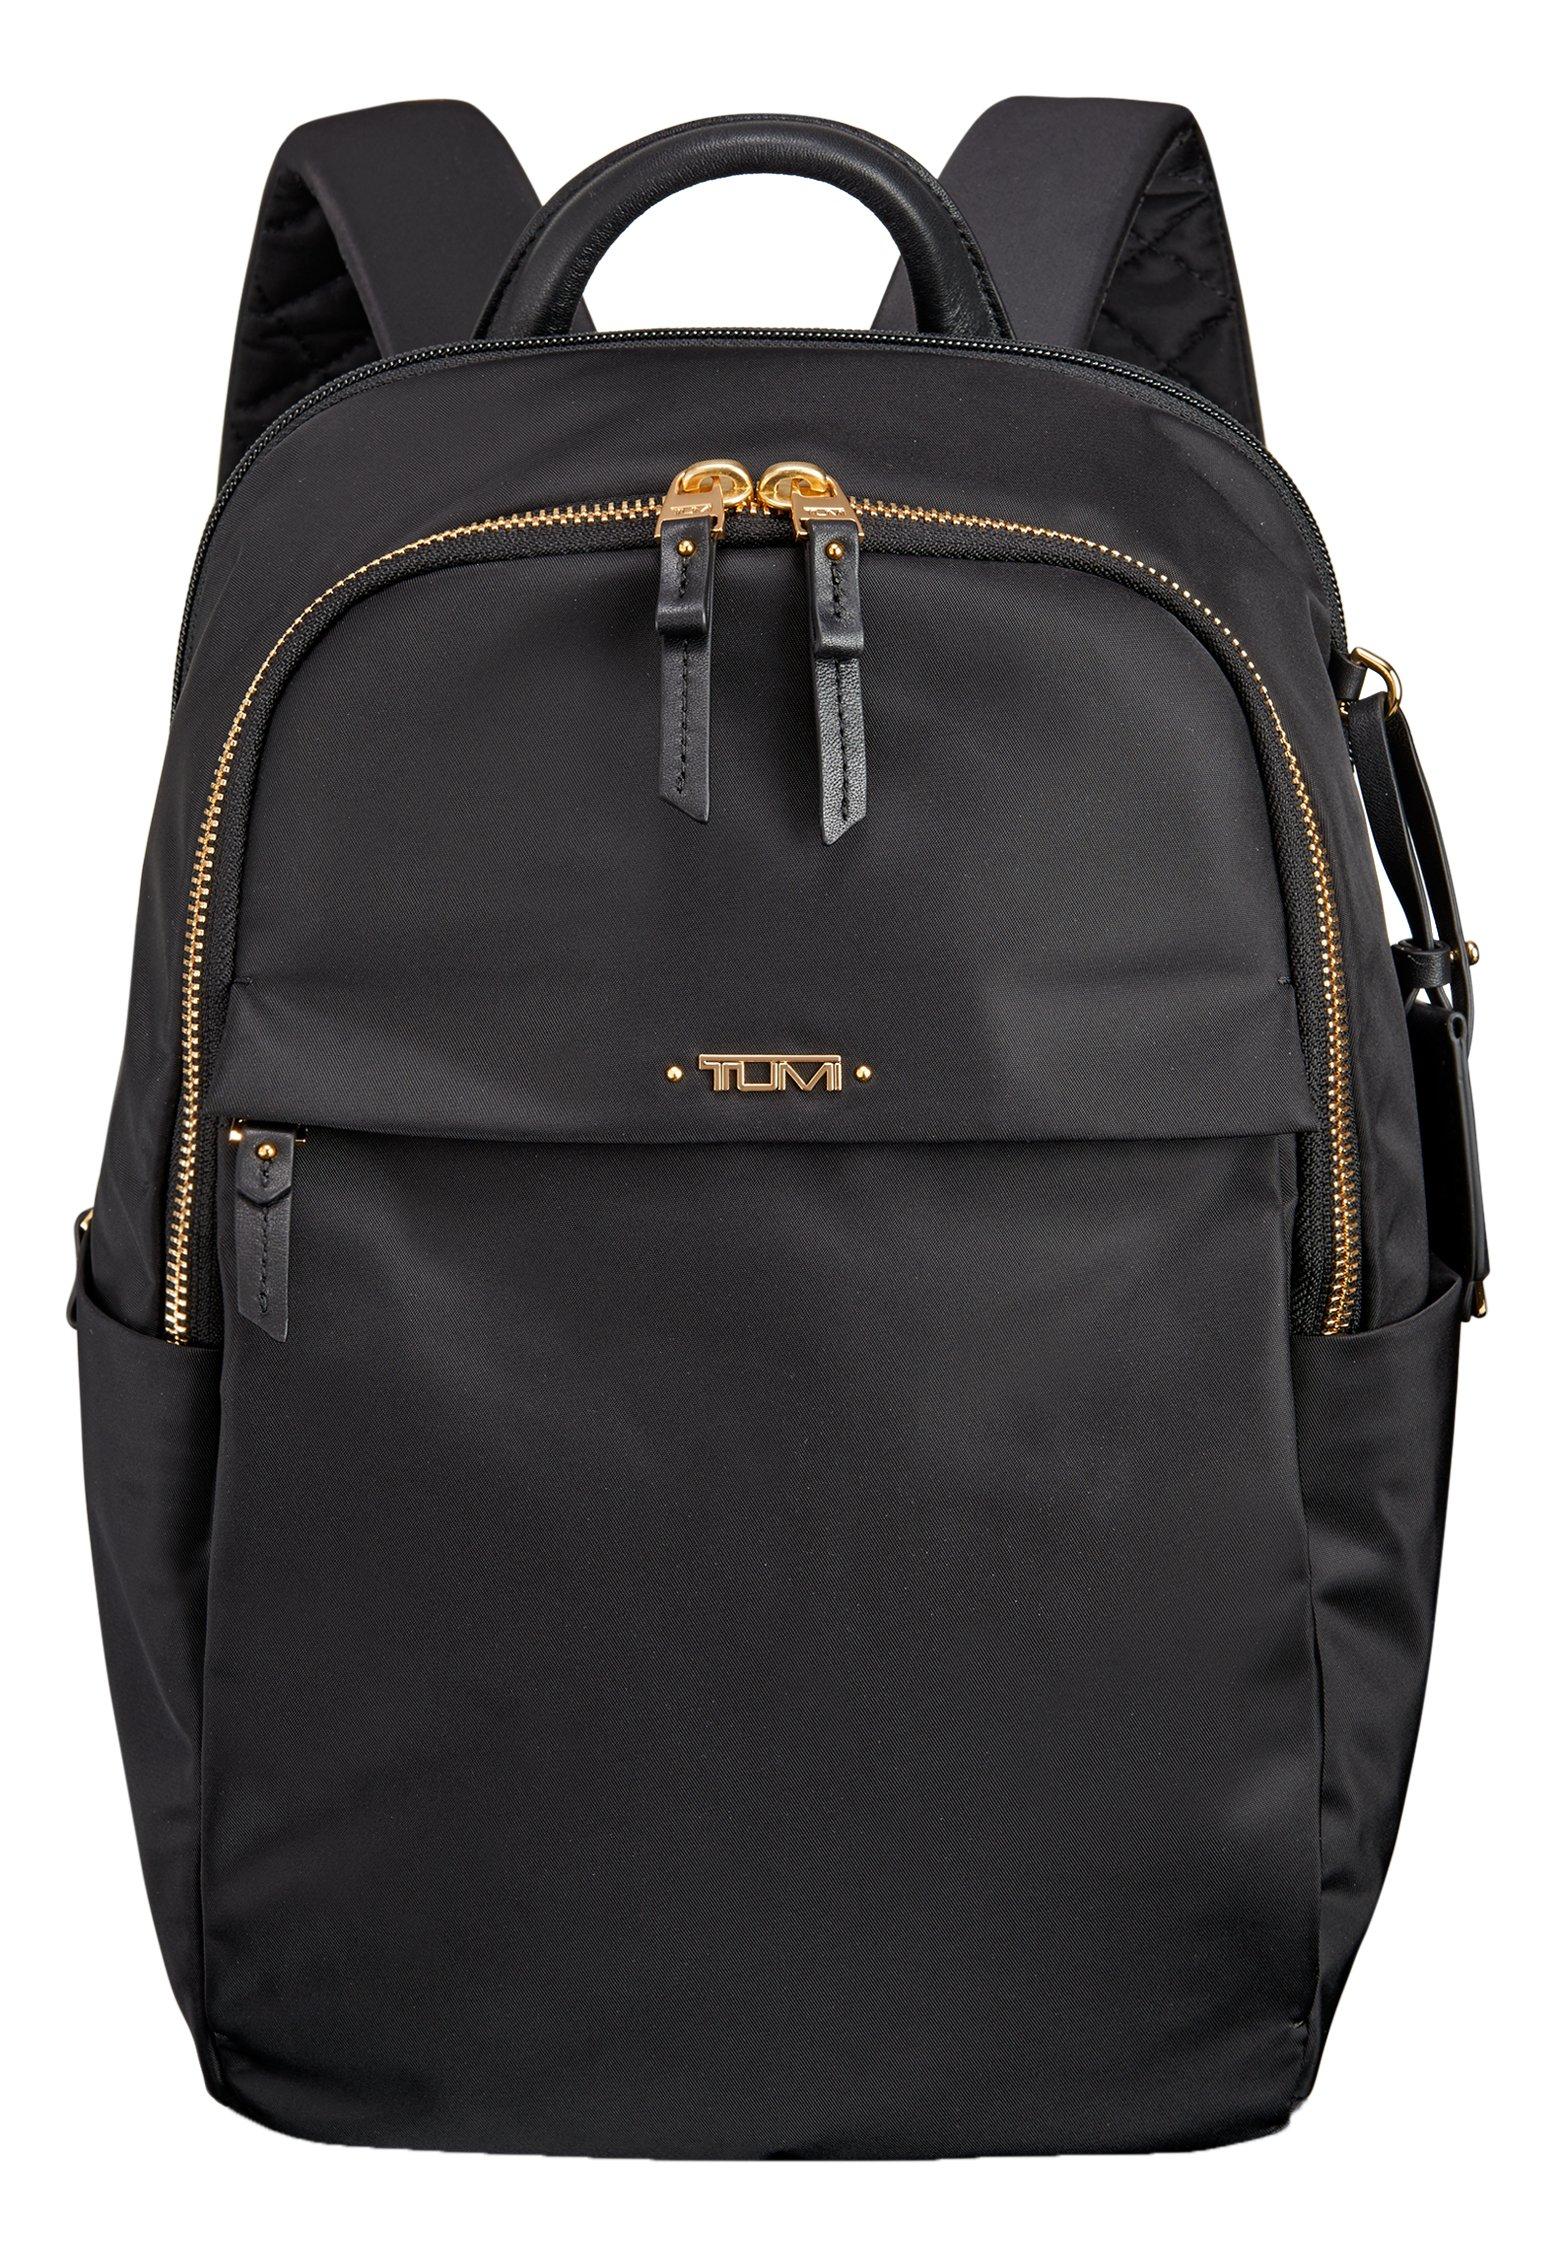 Tumi Voyageur Daniella Small Backpack, Black